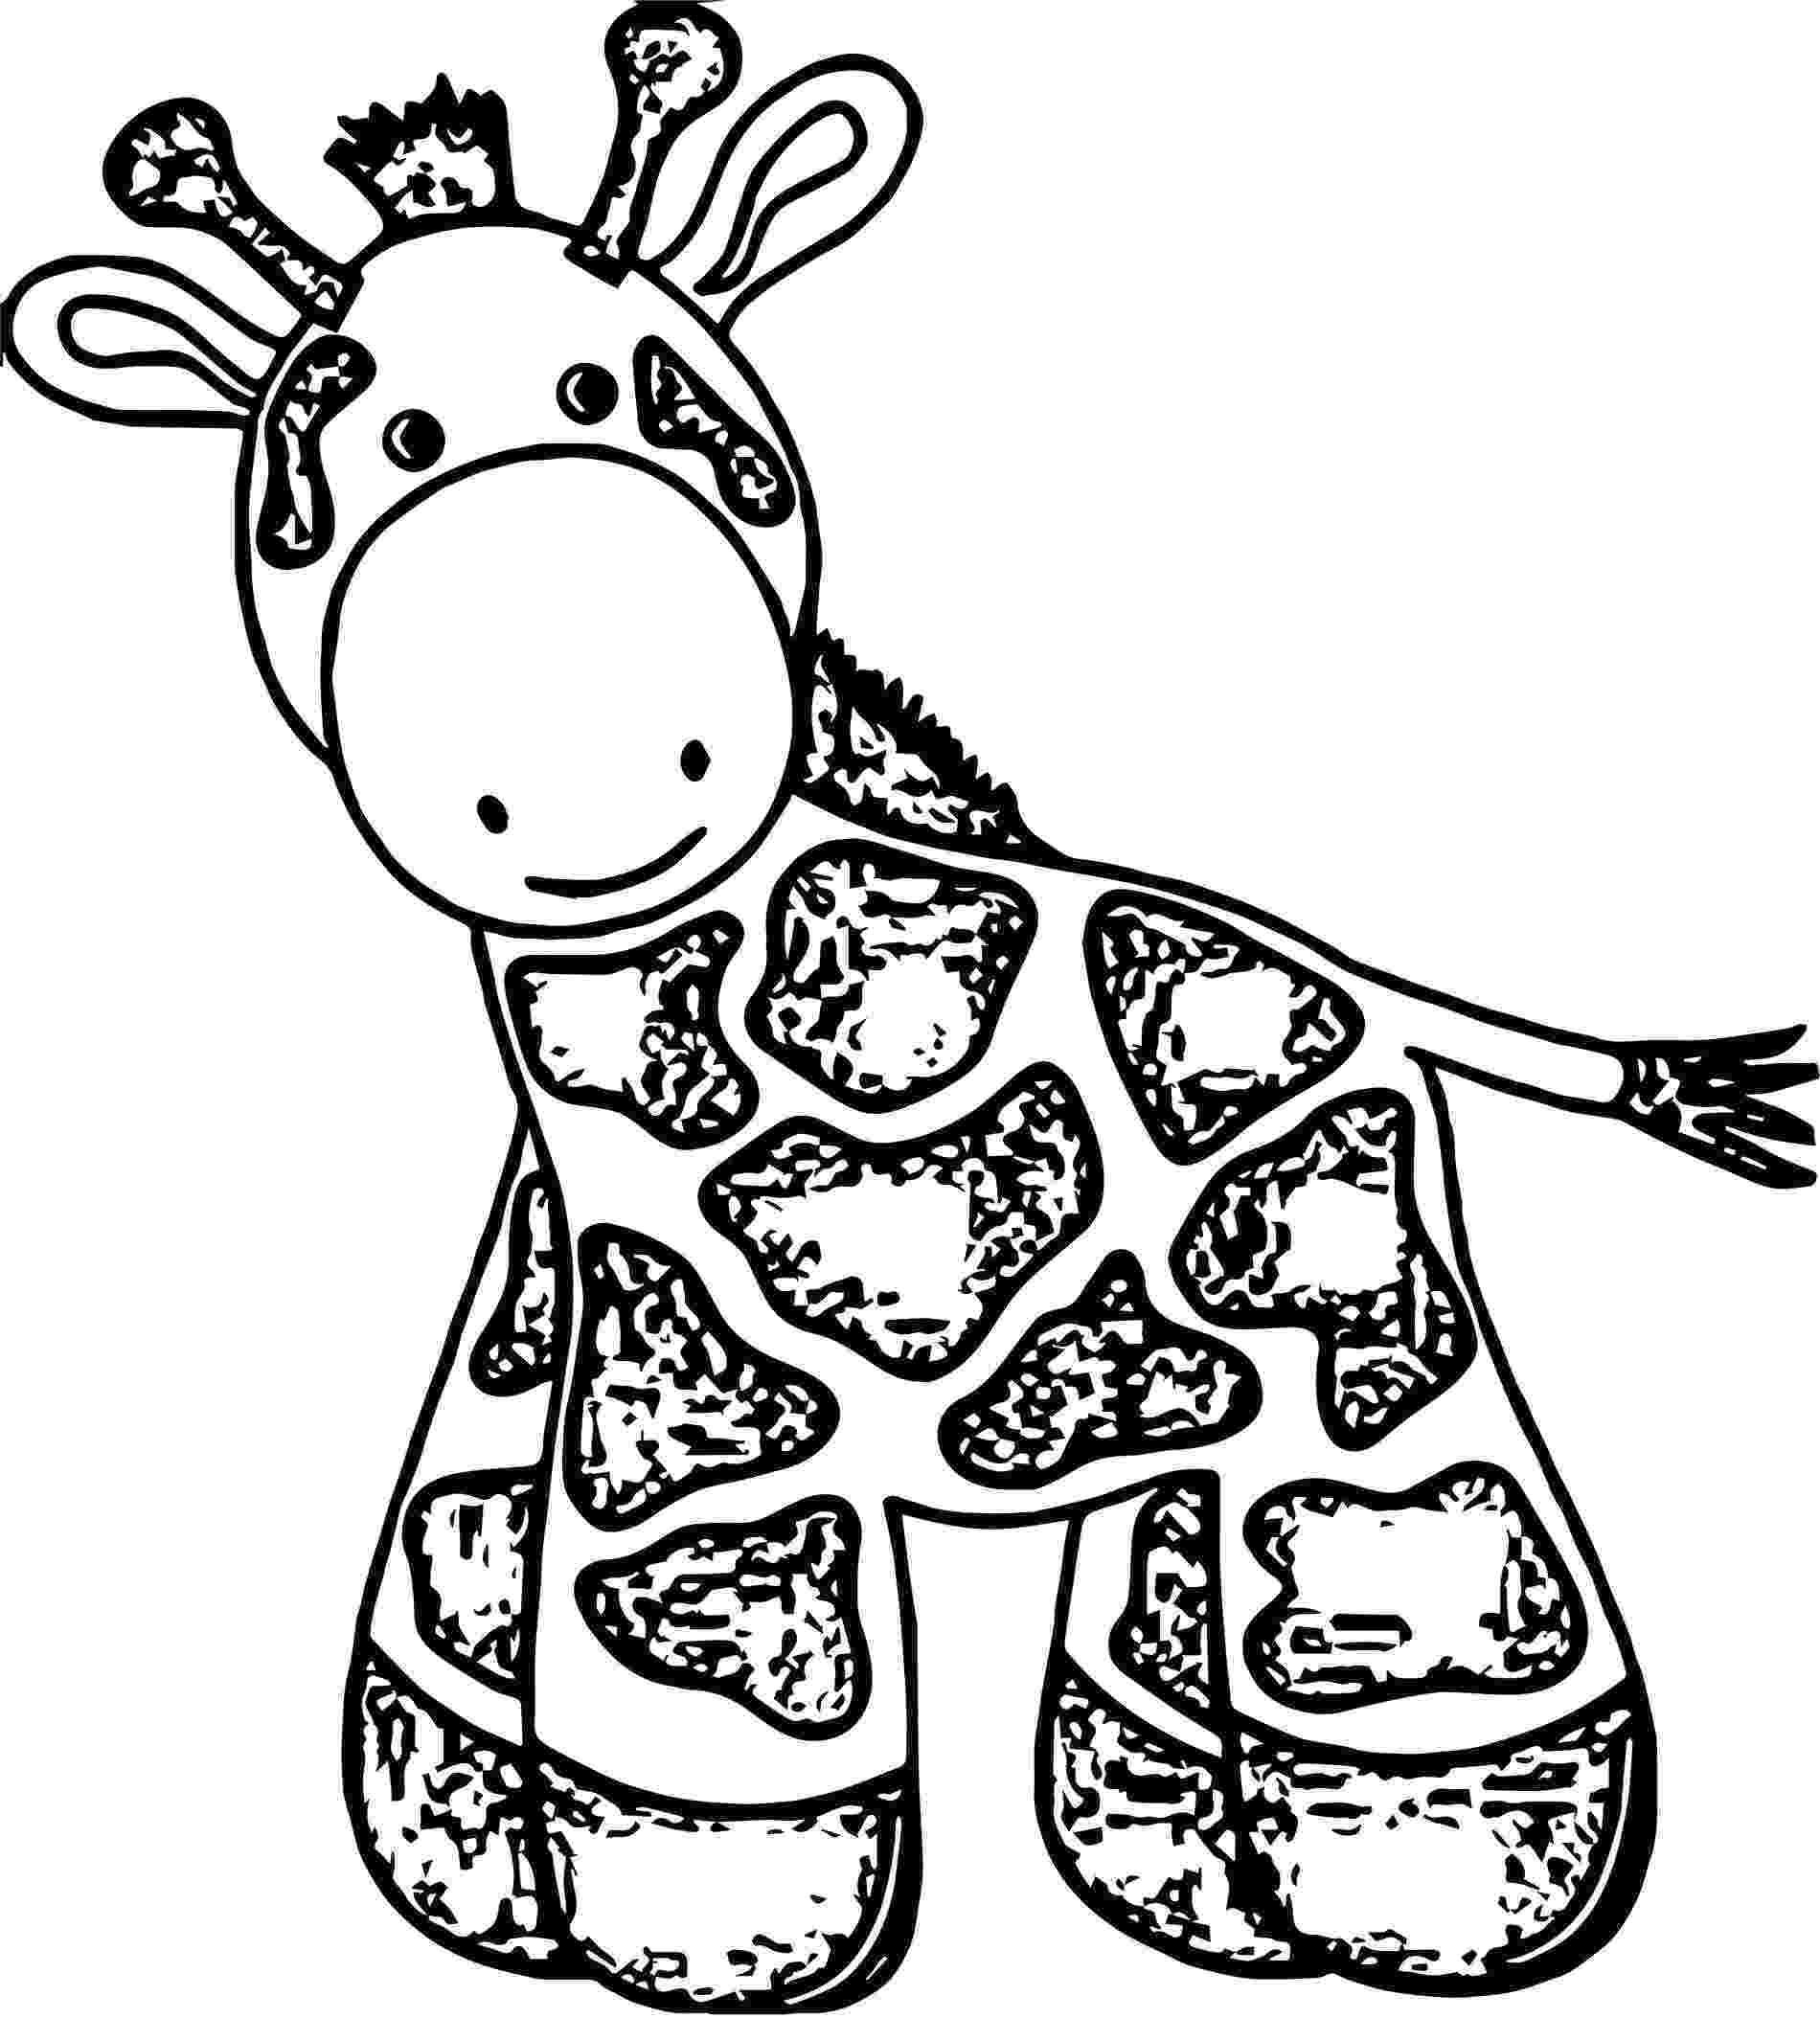 cartoon giraffe giraffe animal toy free image on pixabay giraffe cartoon